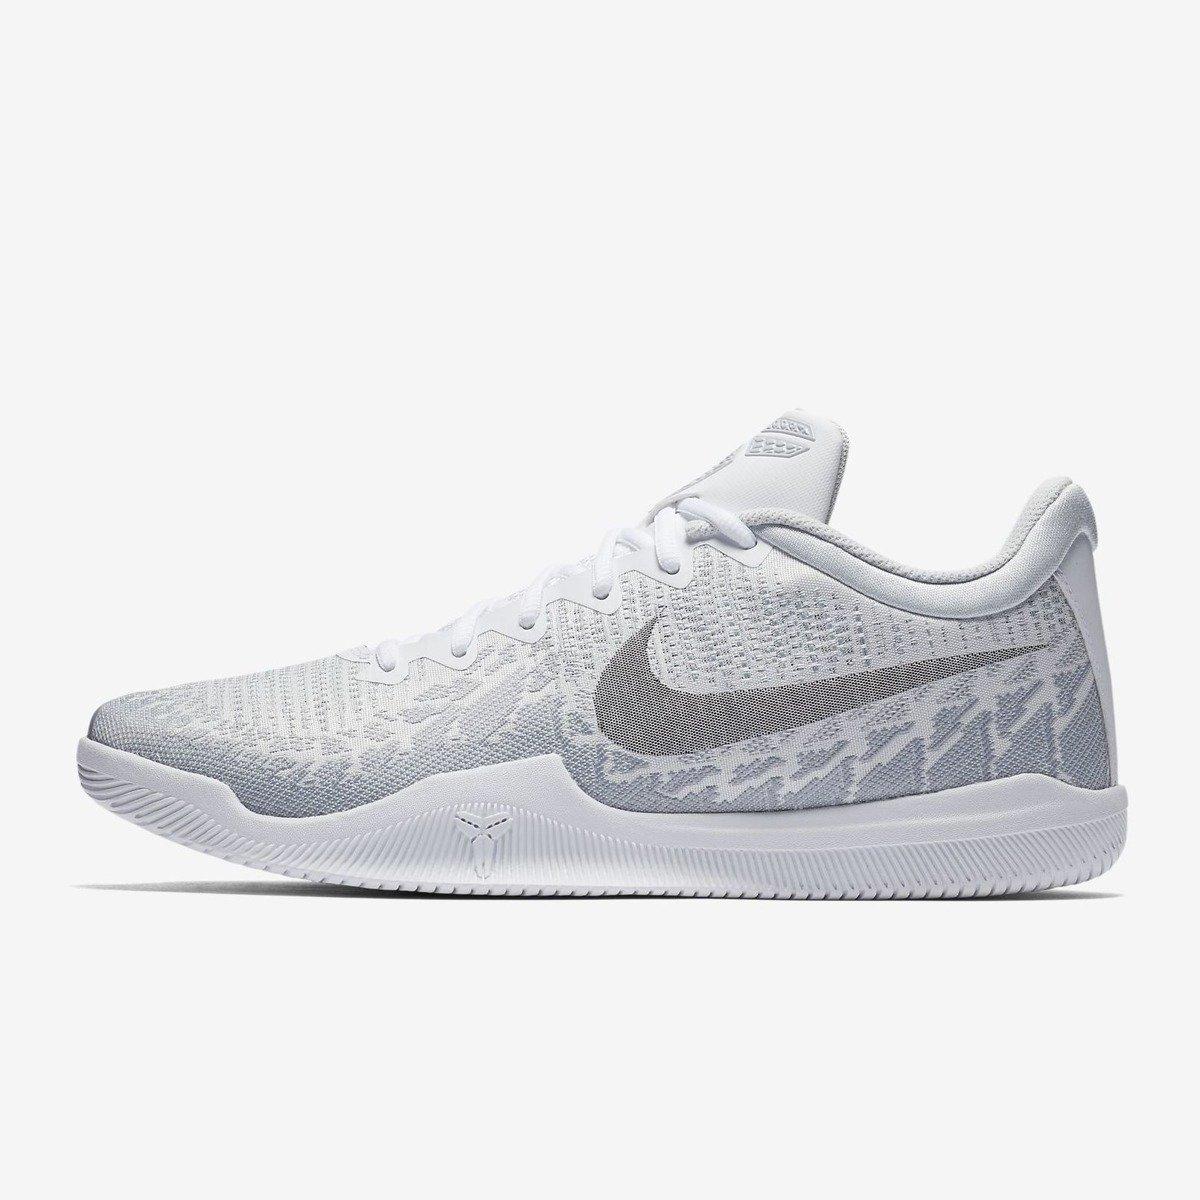 watch 08ed2 6c4e3 ... Nike Mamba Rage Pure Platinum Shoes - 908972-100 ...